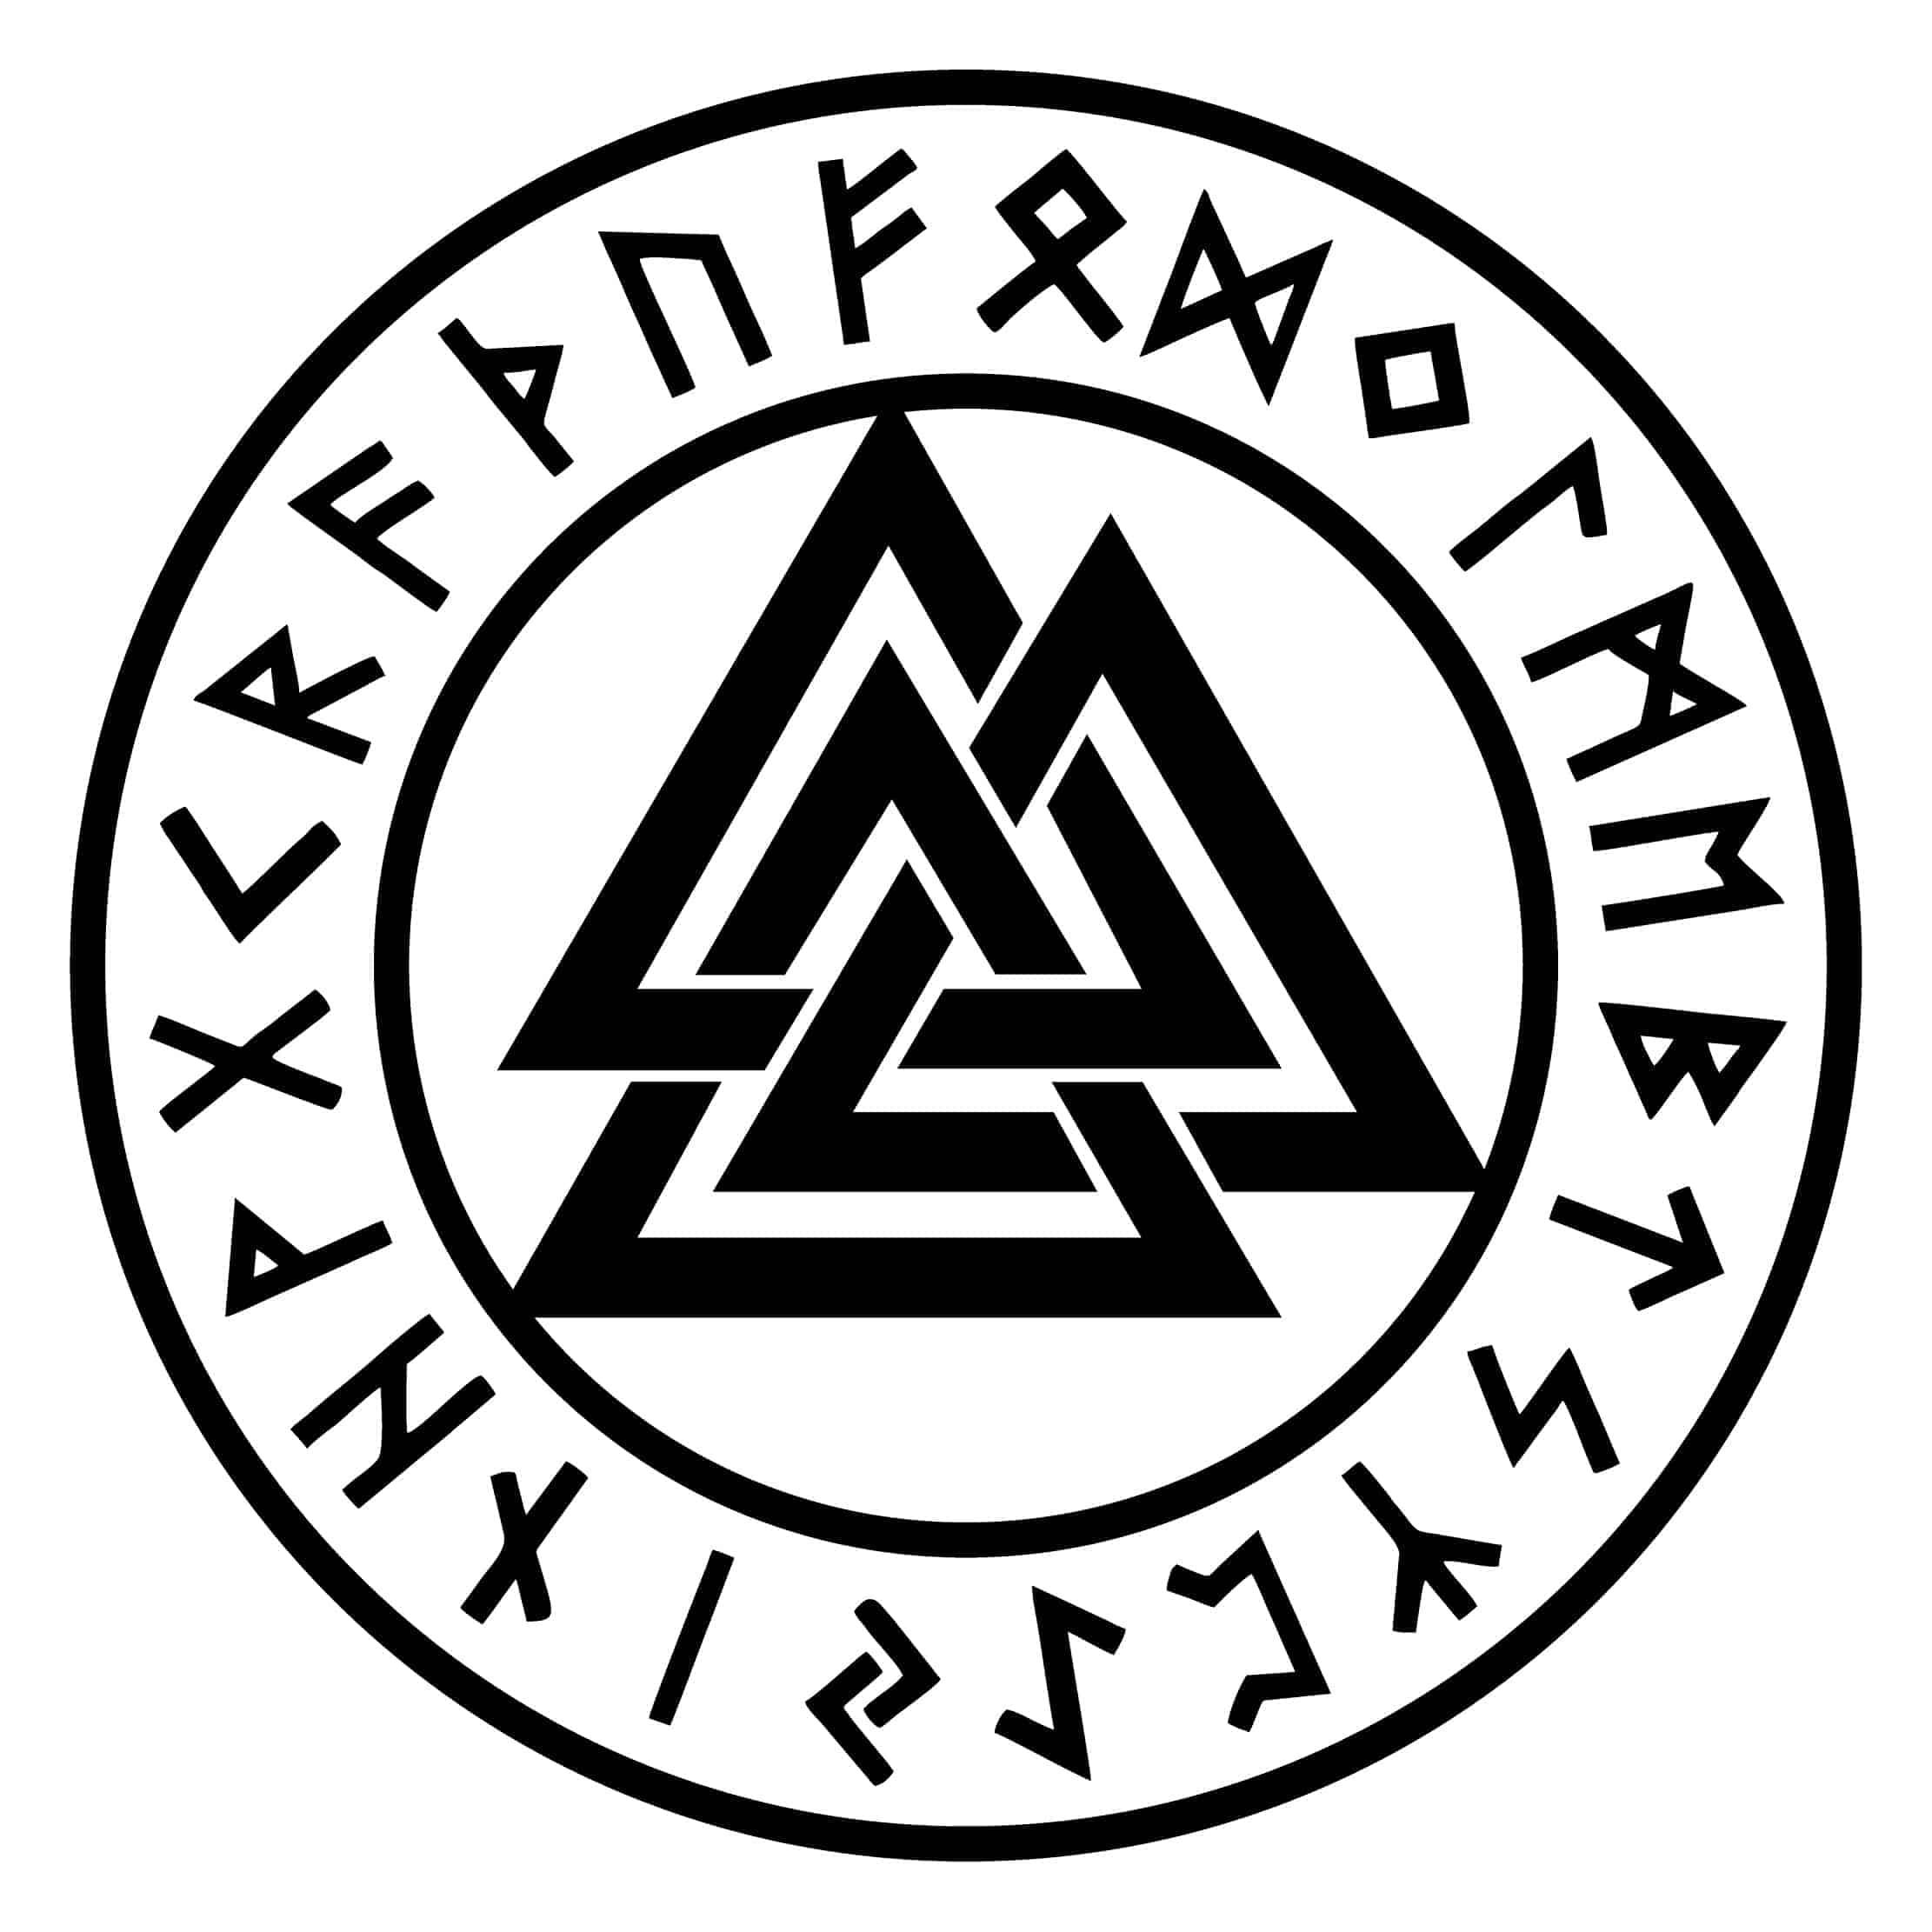 Valknut, Odin's Symbol, the Knot of the Slain Warrior